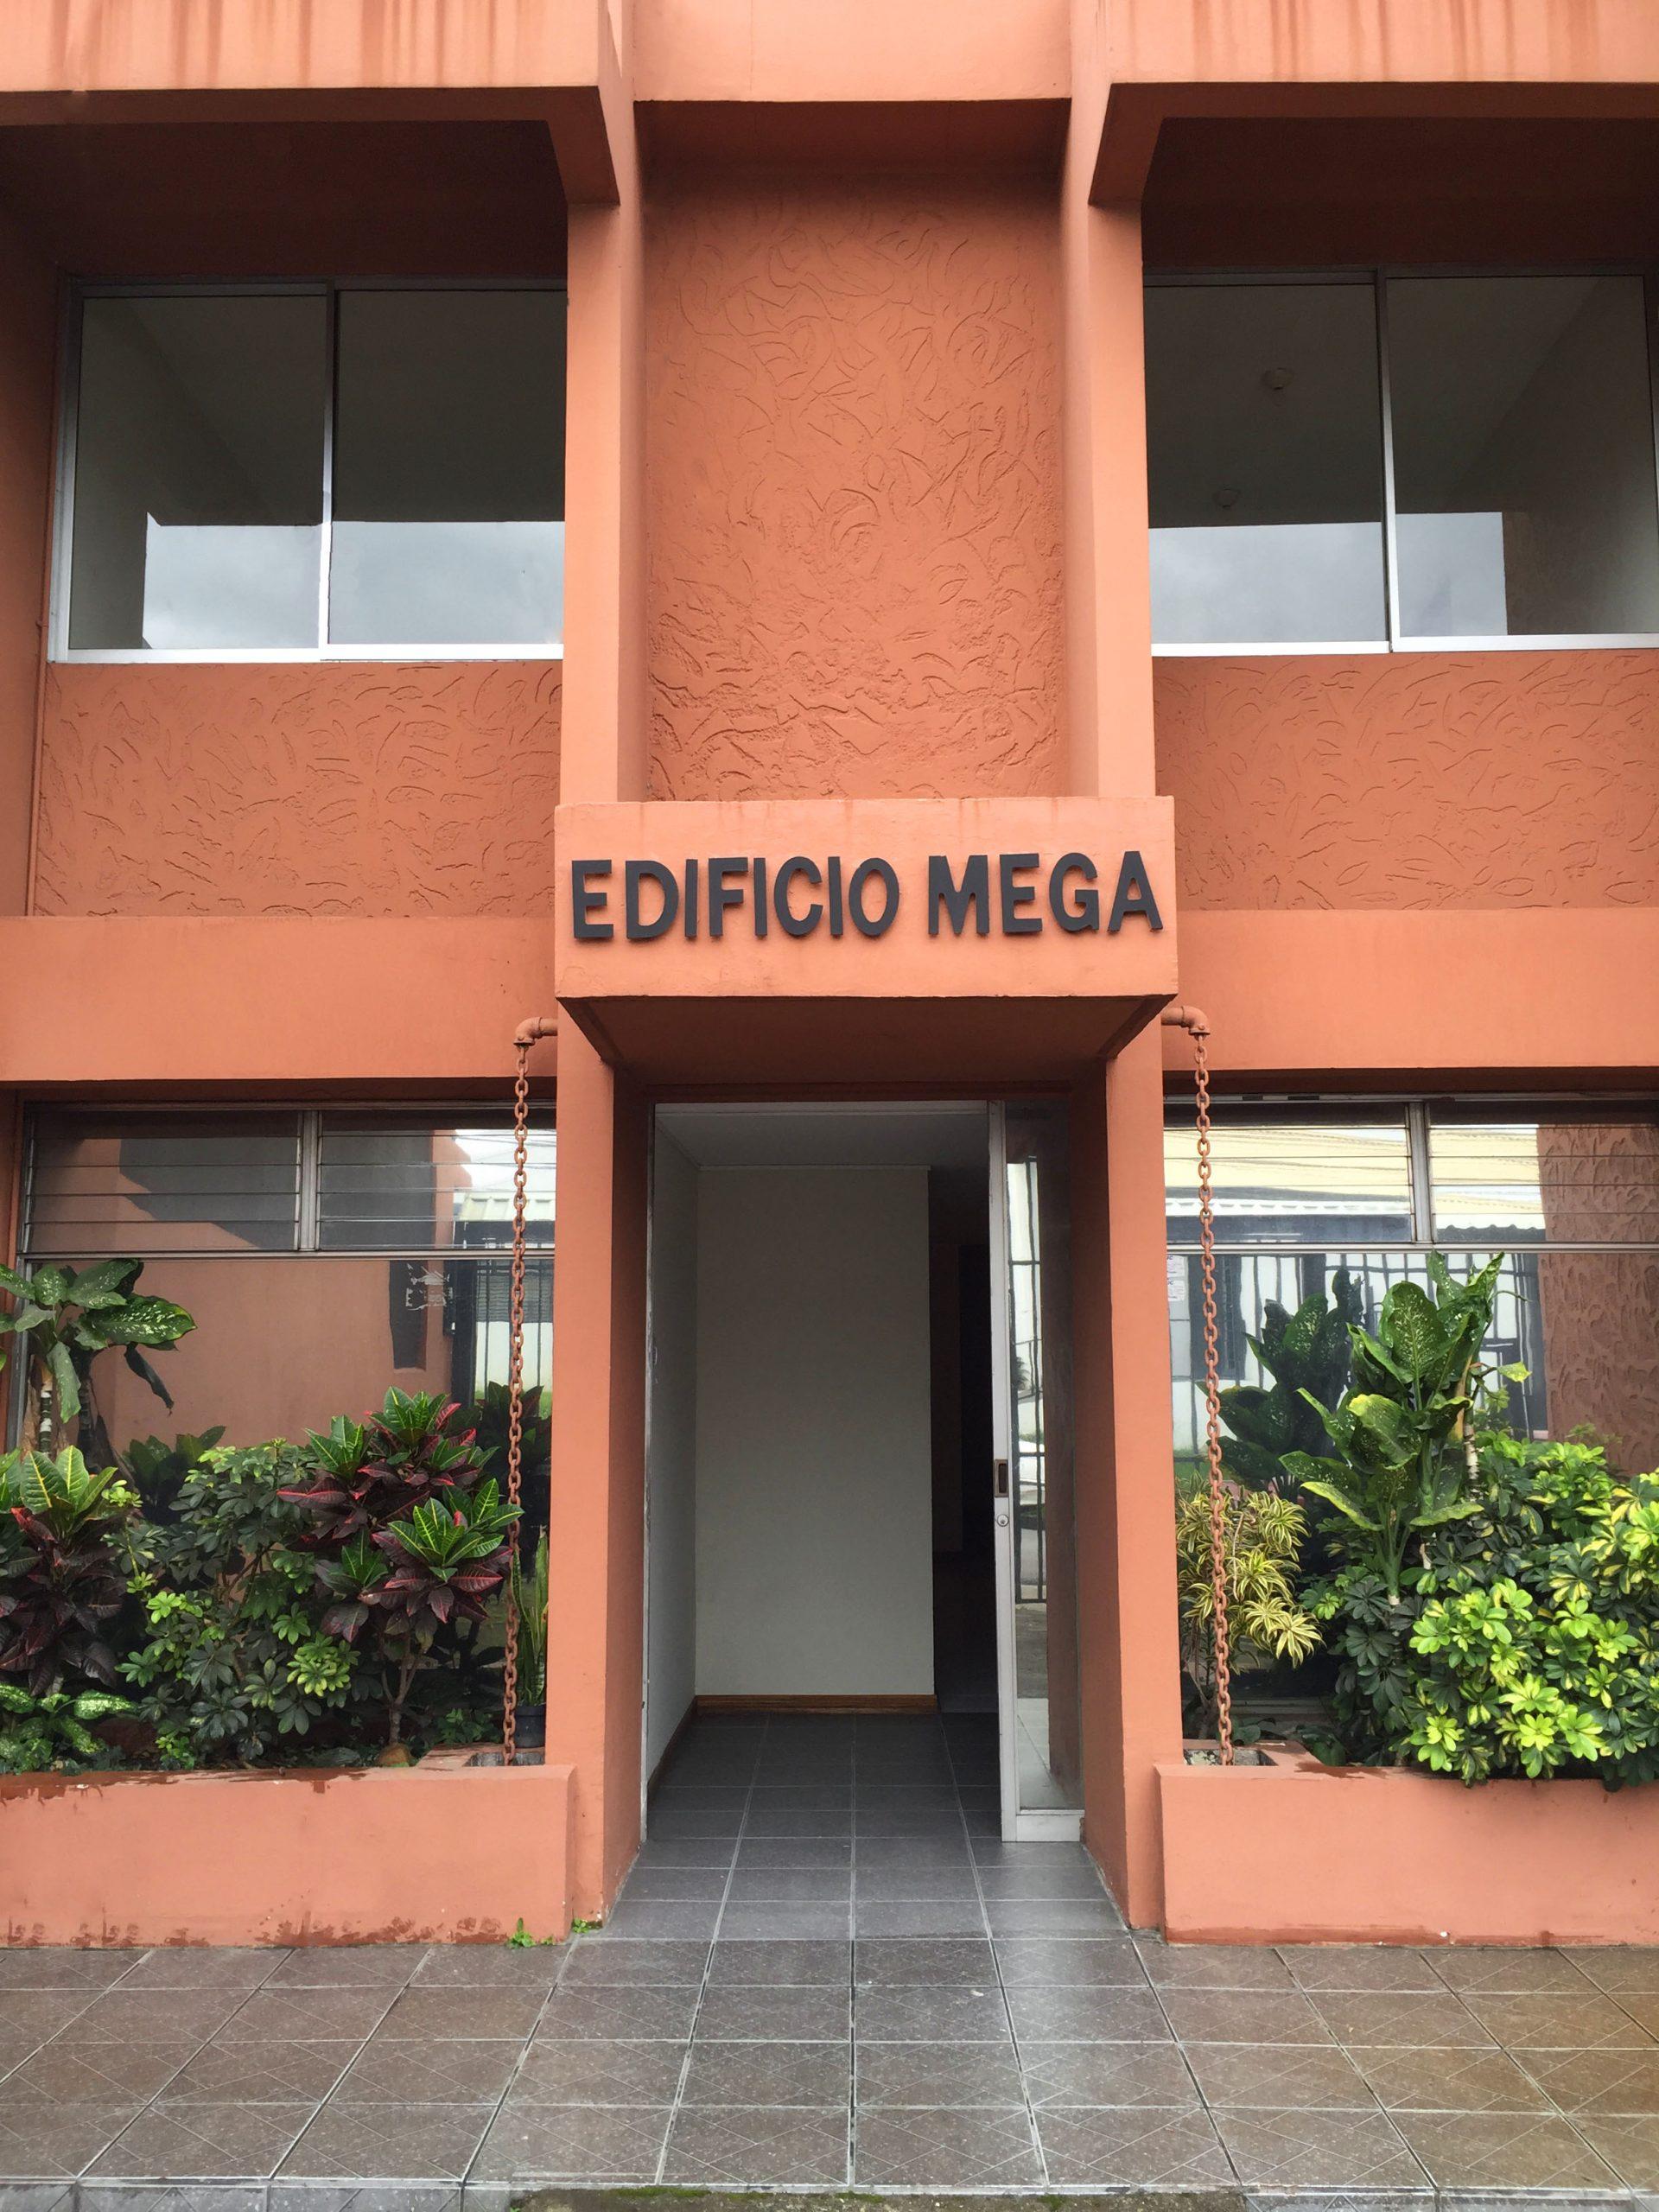 Edificio San Pedro de Montes de Oca